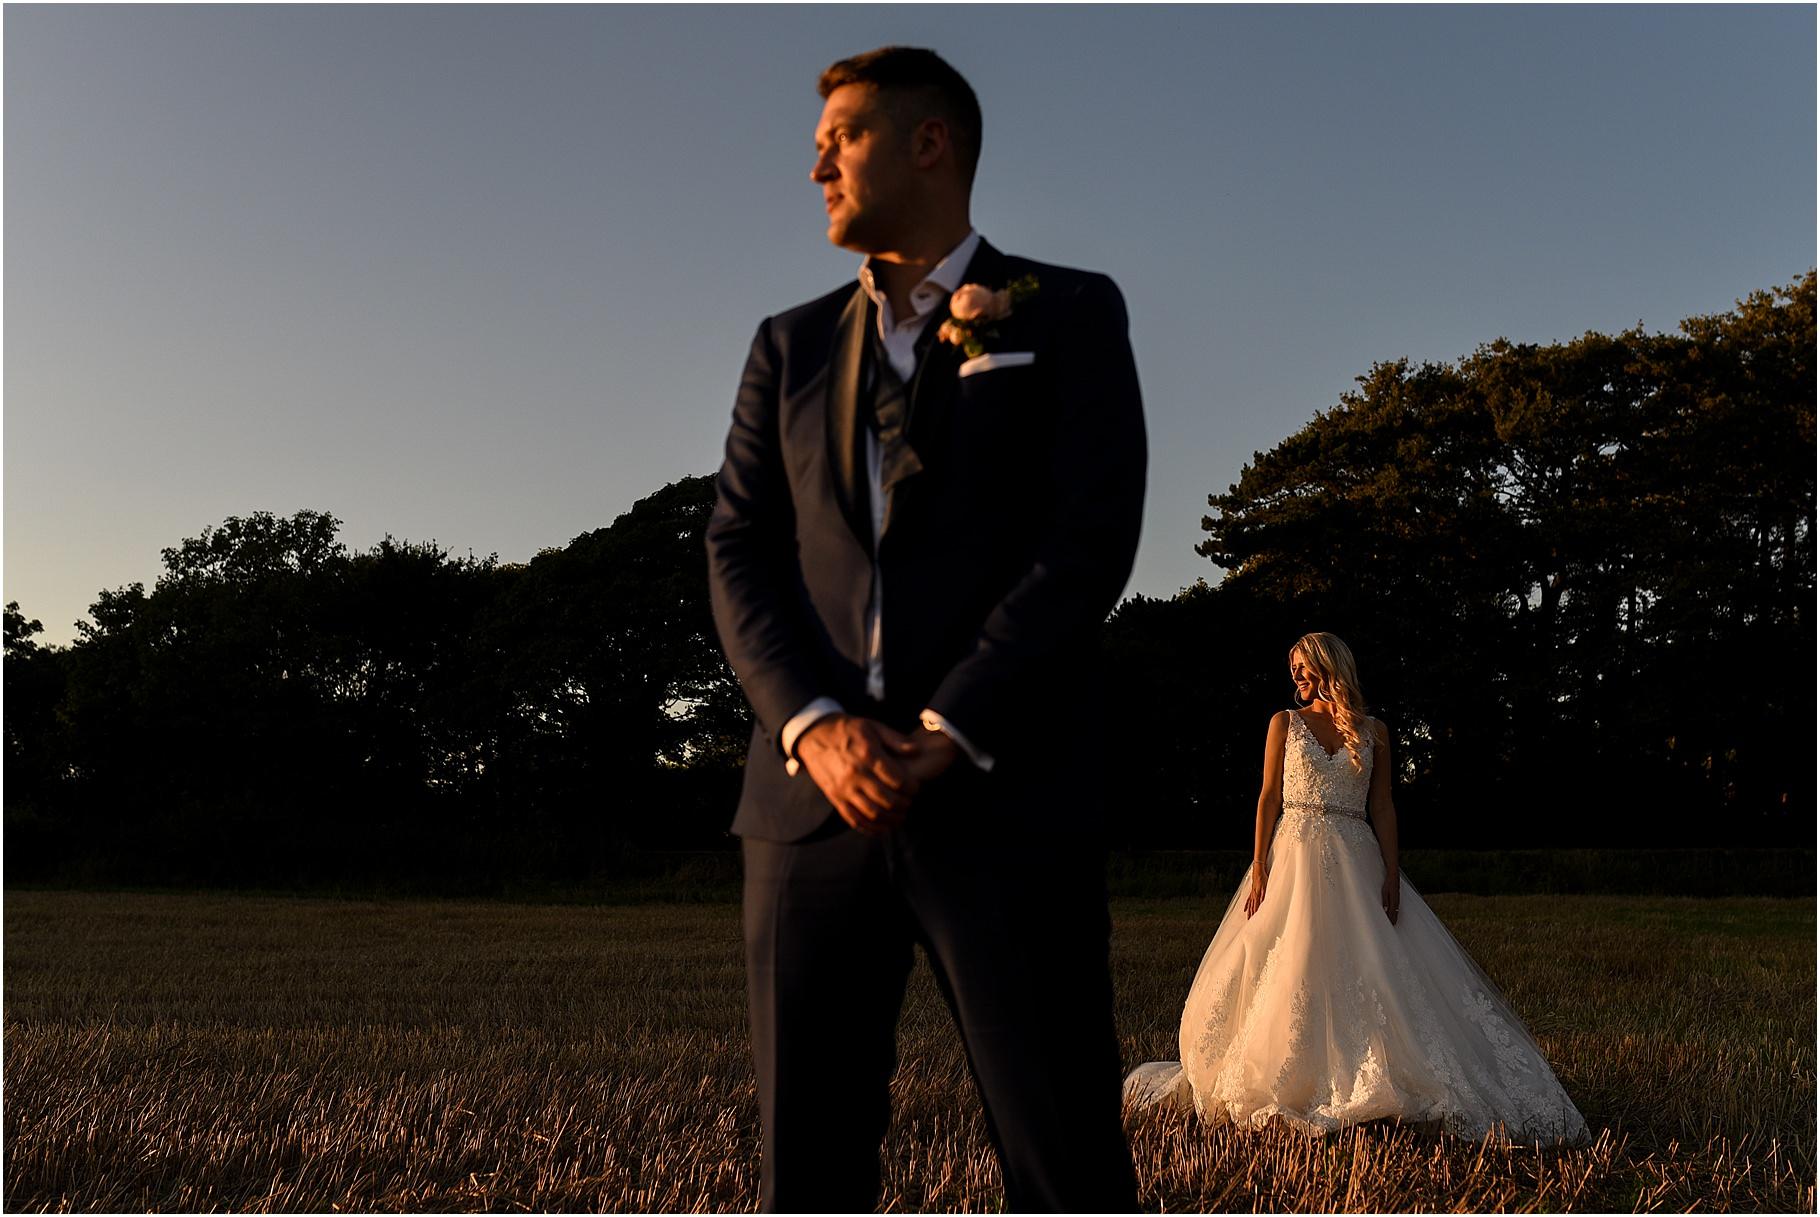 dan-wootton-photography-2017-weddings-035.jpg